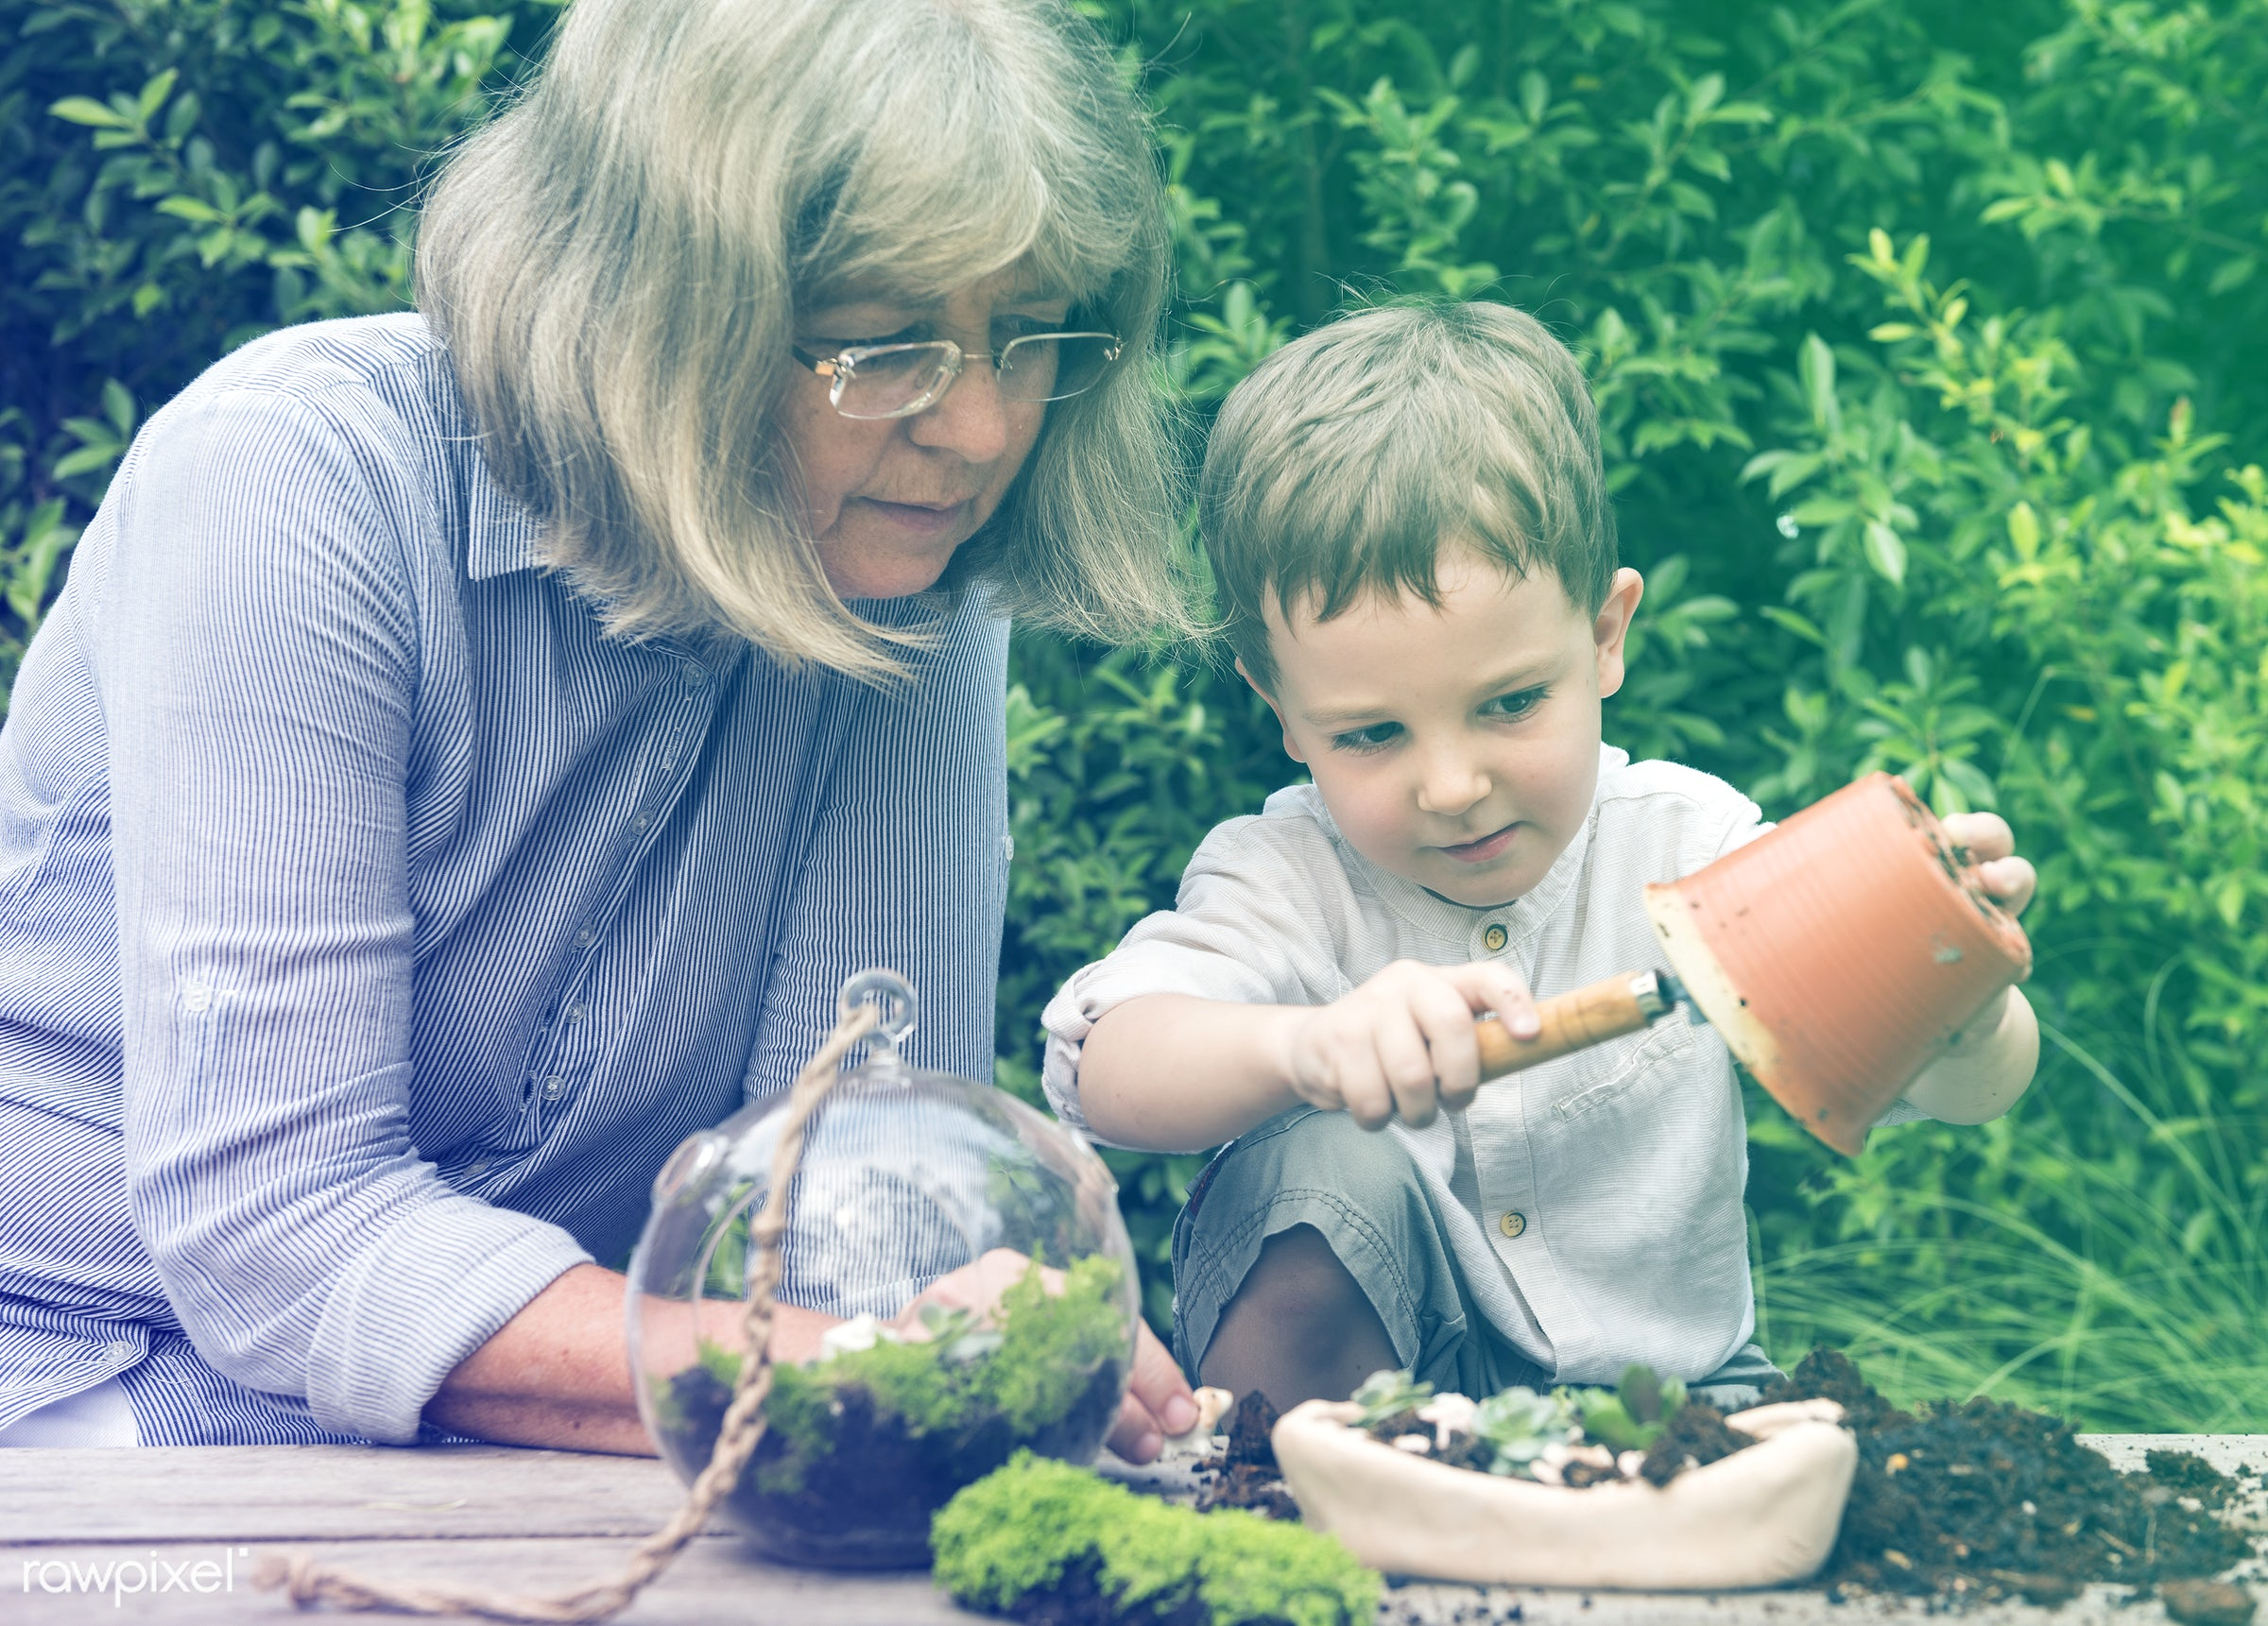 succulent, handicraft, terrarium, botanical, decor, lomo, nature, woman, composition, grandson, hobby, horticulture,...